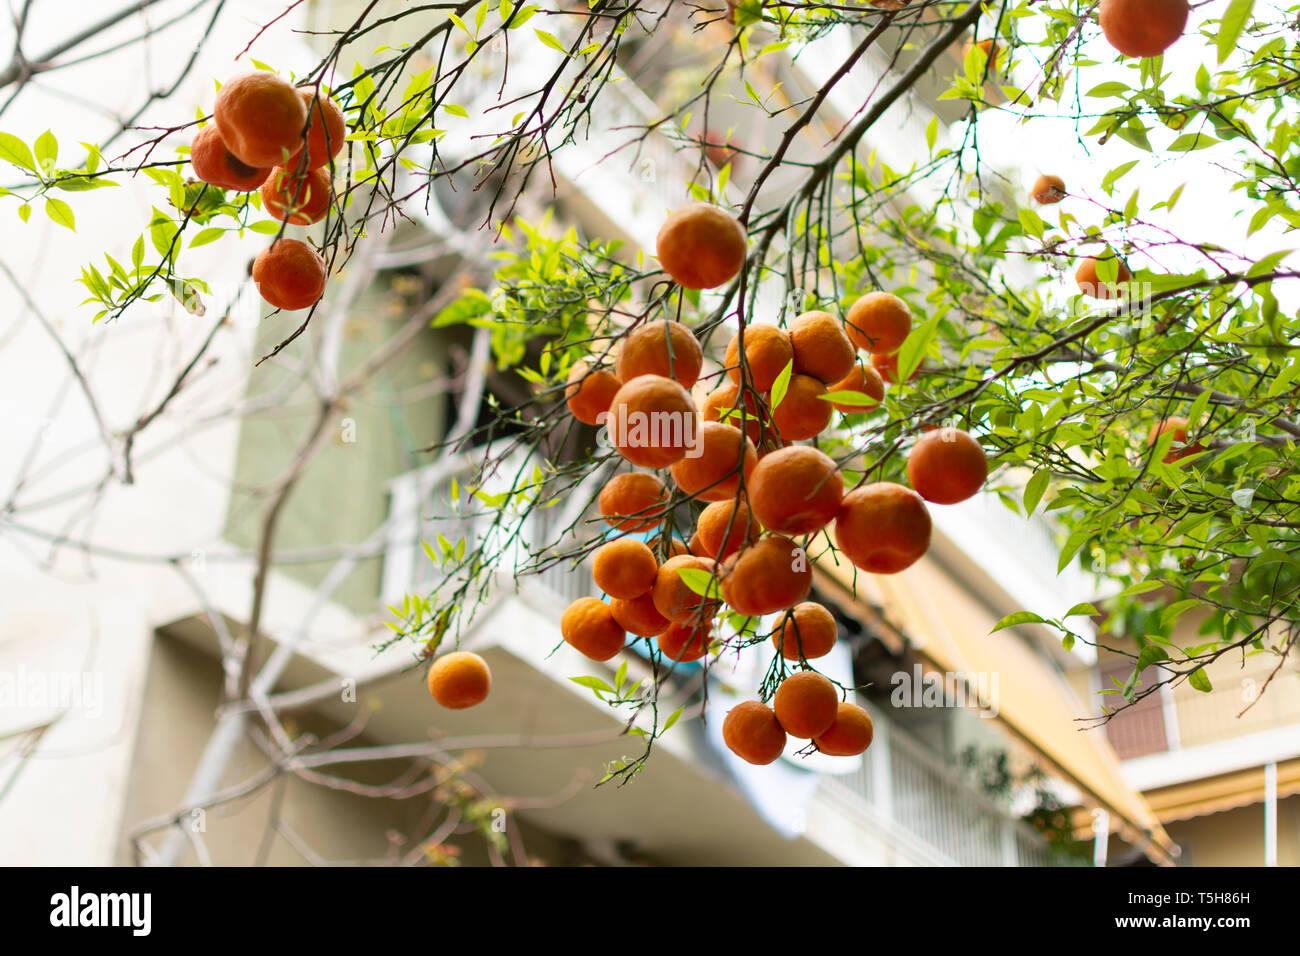 Ripe orange mandarine citrus fruit hanging on tree in Athens, Greece Stock Photo